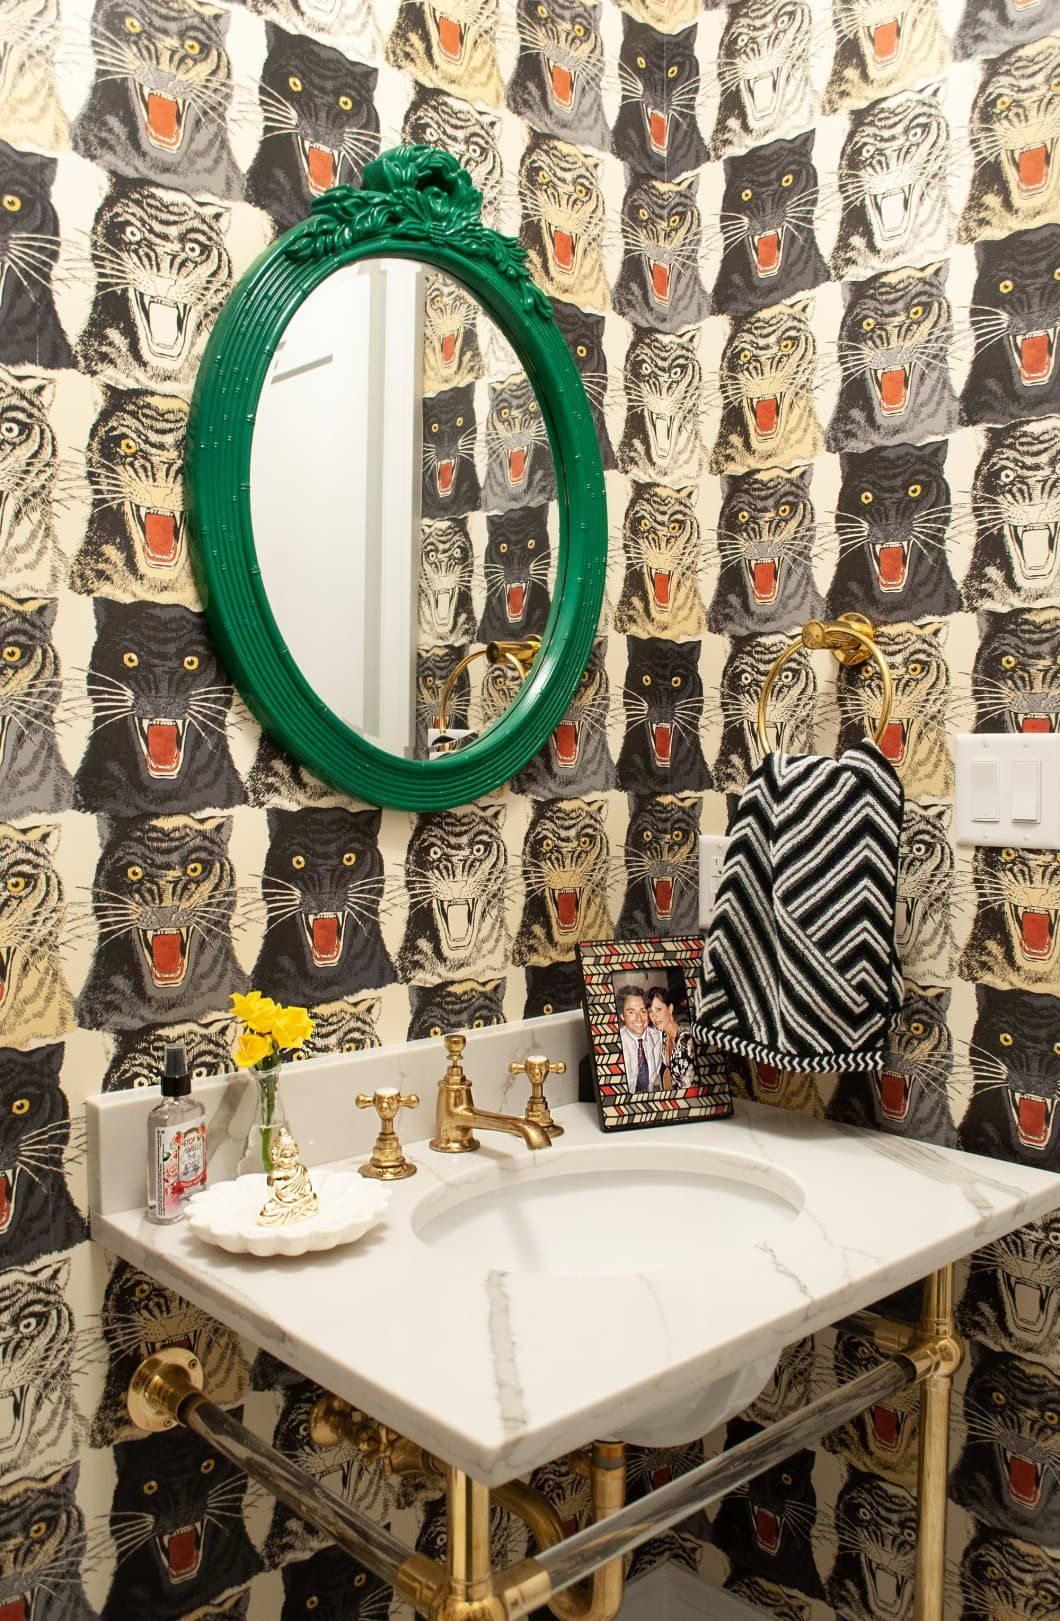 19 of the Most Gorgeous Half Bath Ideas We've Ever Seen | Bold decor,  Rustic bathroom decor, Decor inspiration